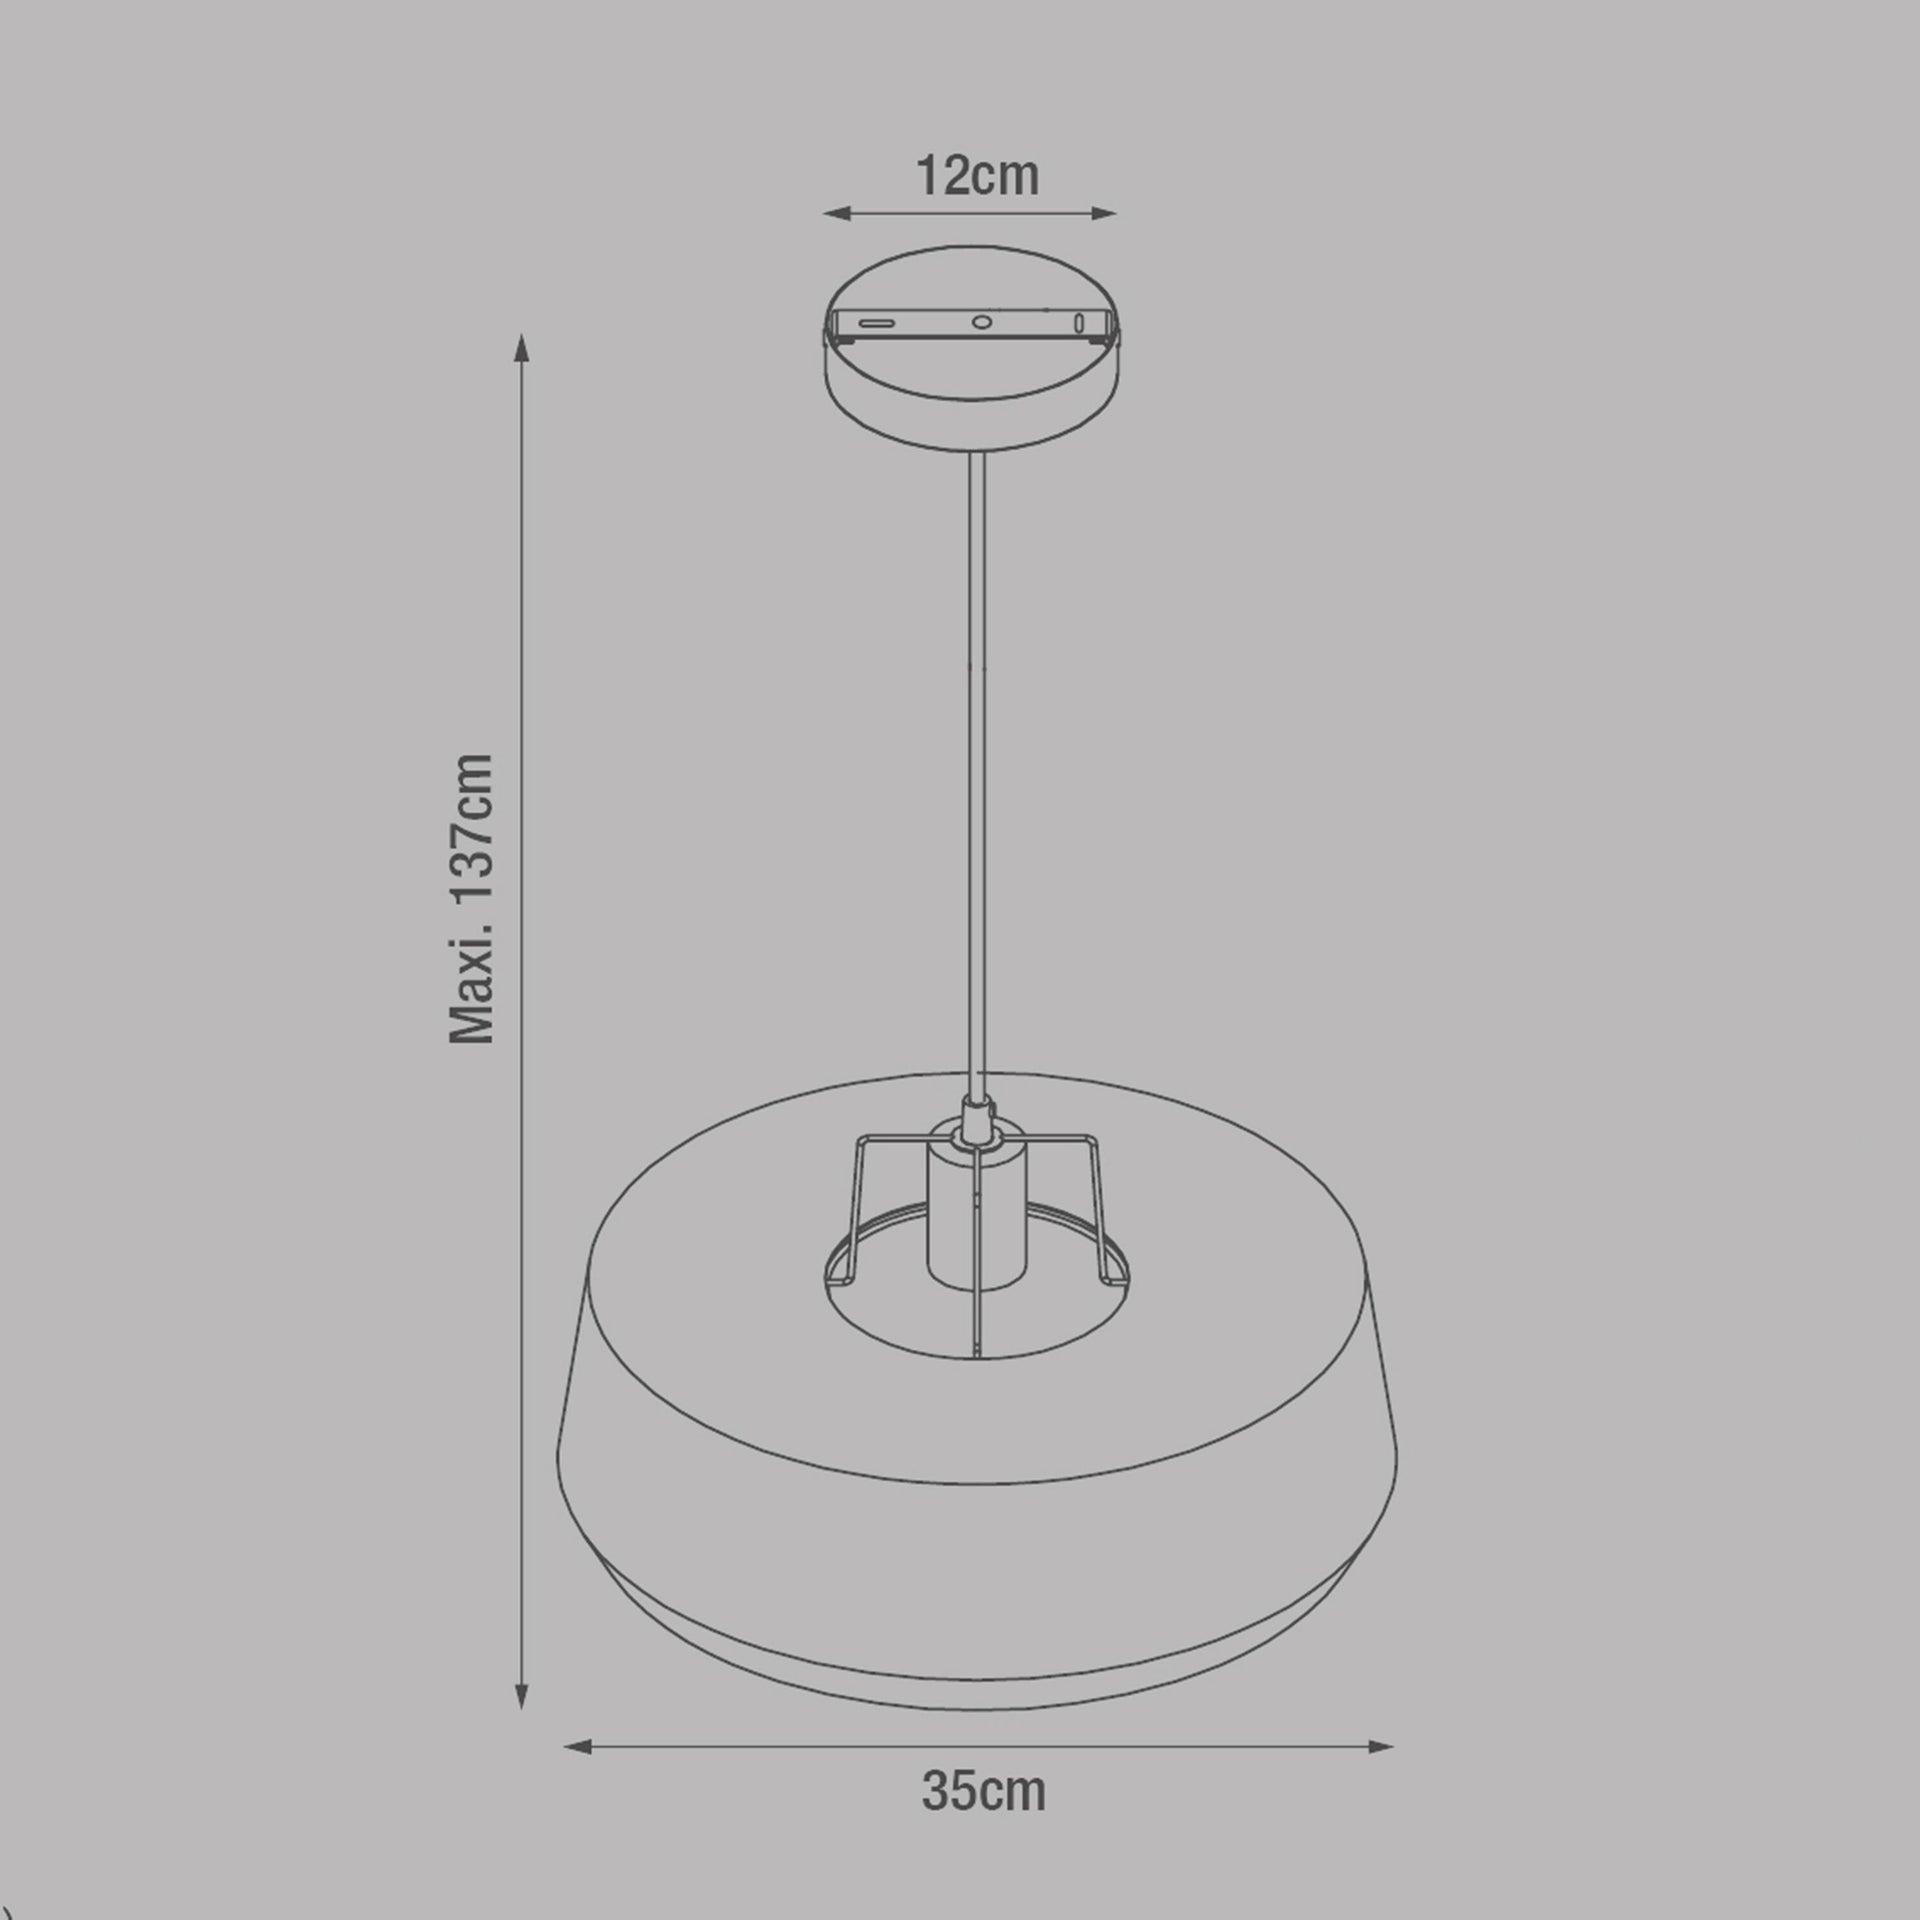 Lampadario Industriale Glint nero in metallo, D. 35 cm, L. 32 cm, INSPIRE - 6